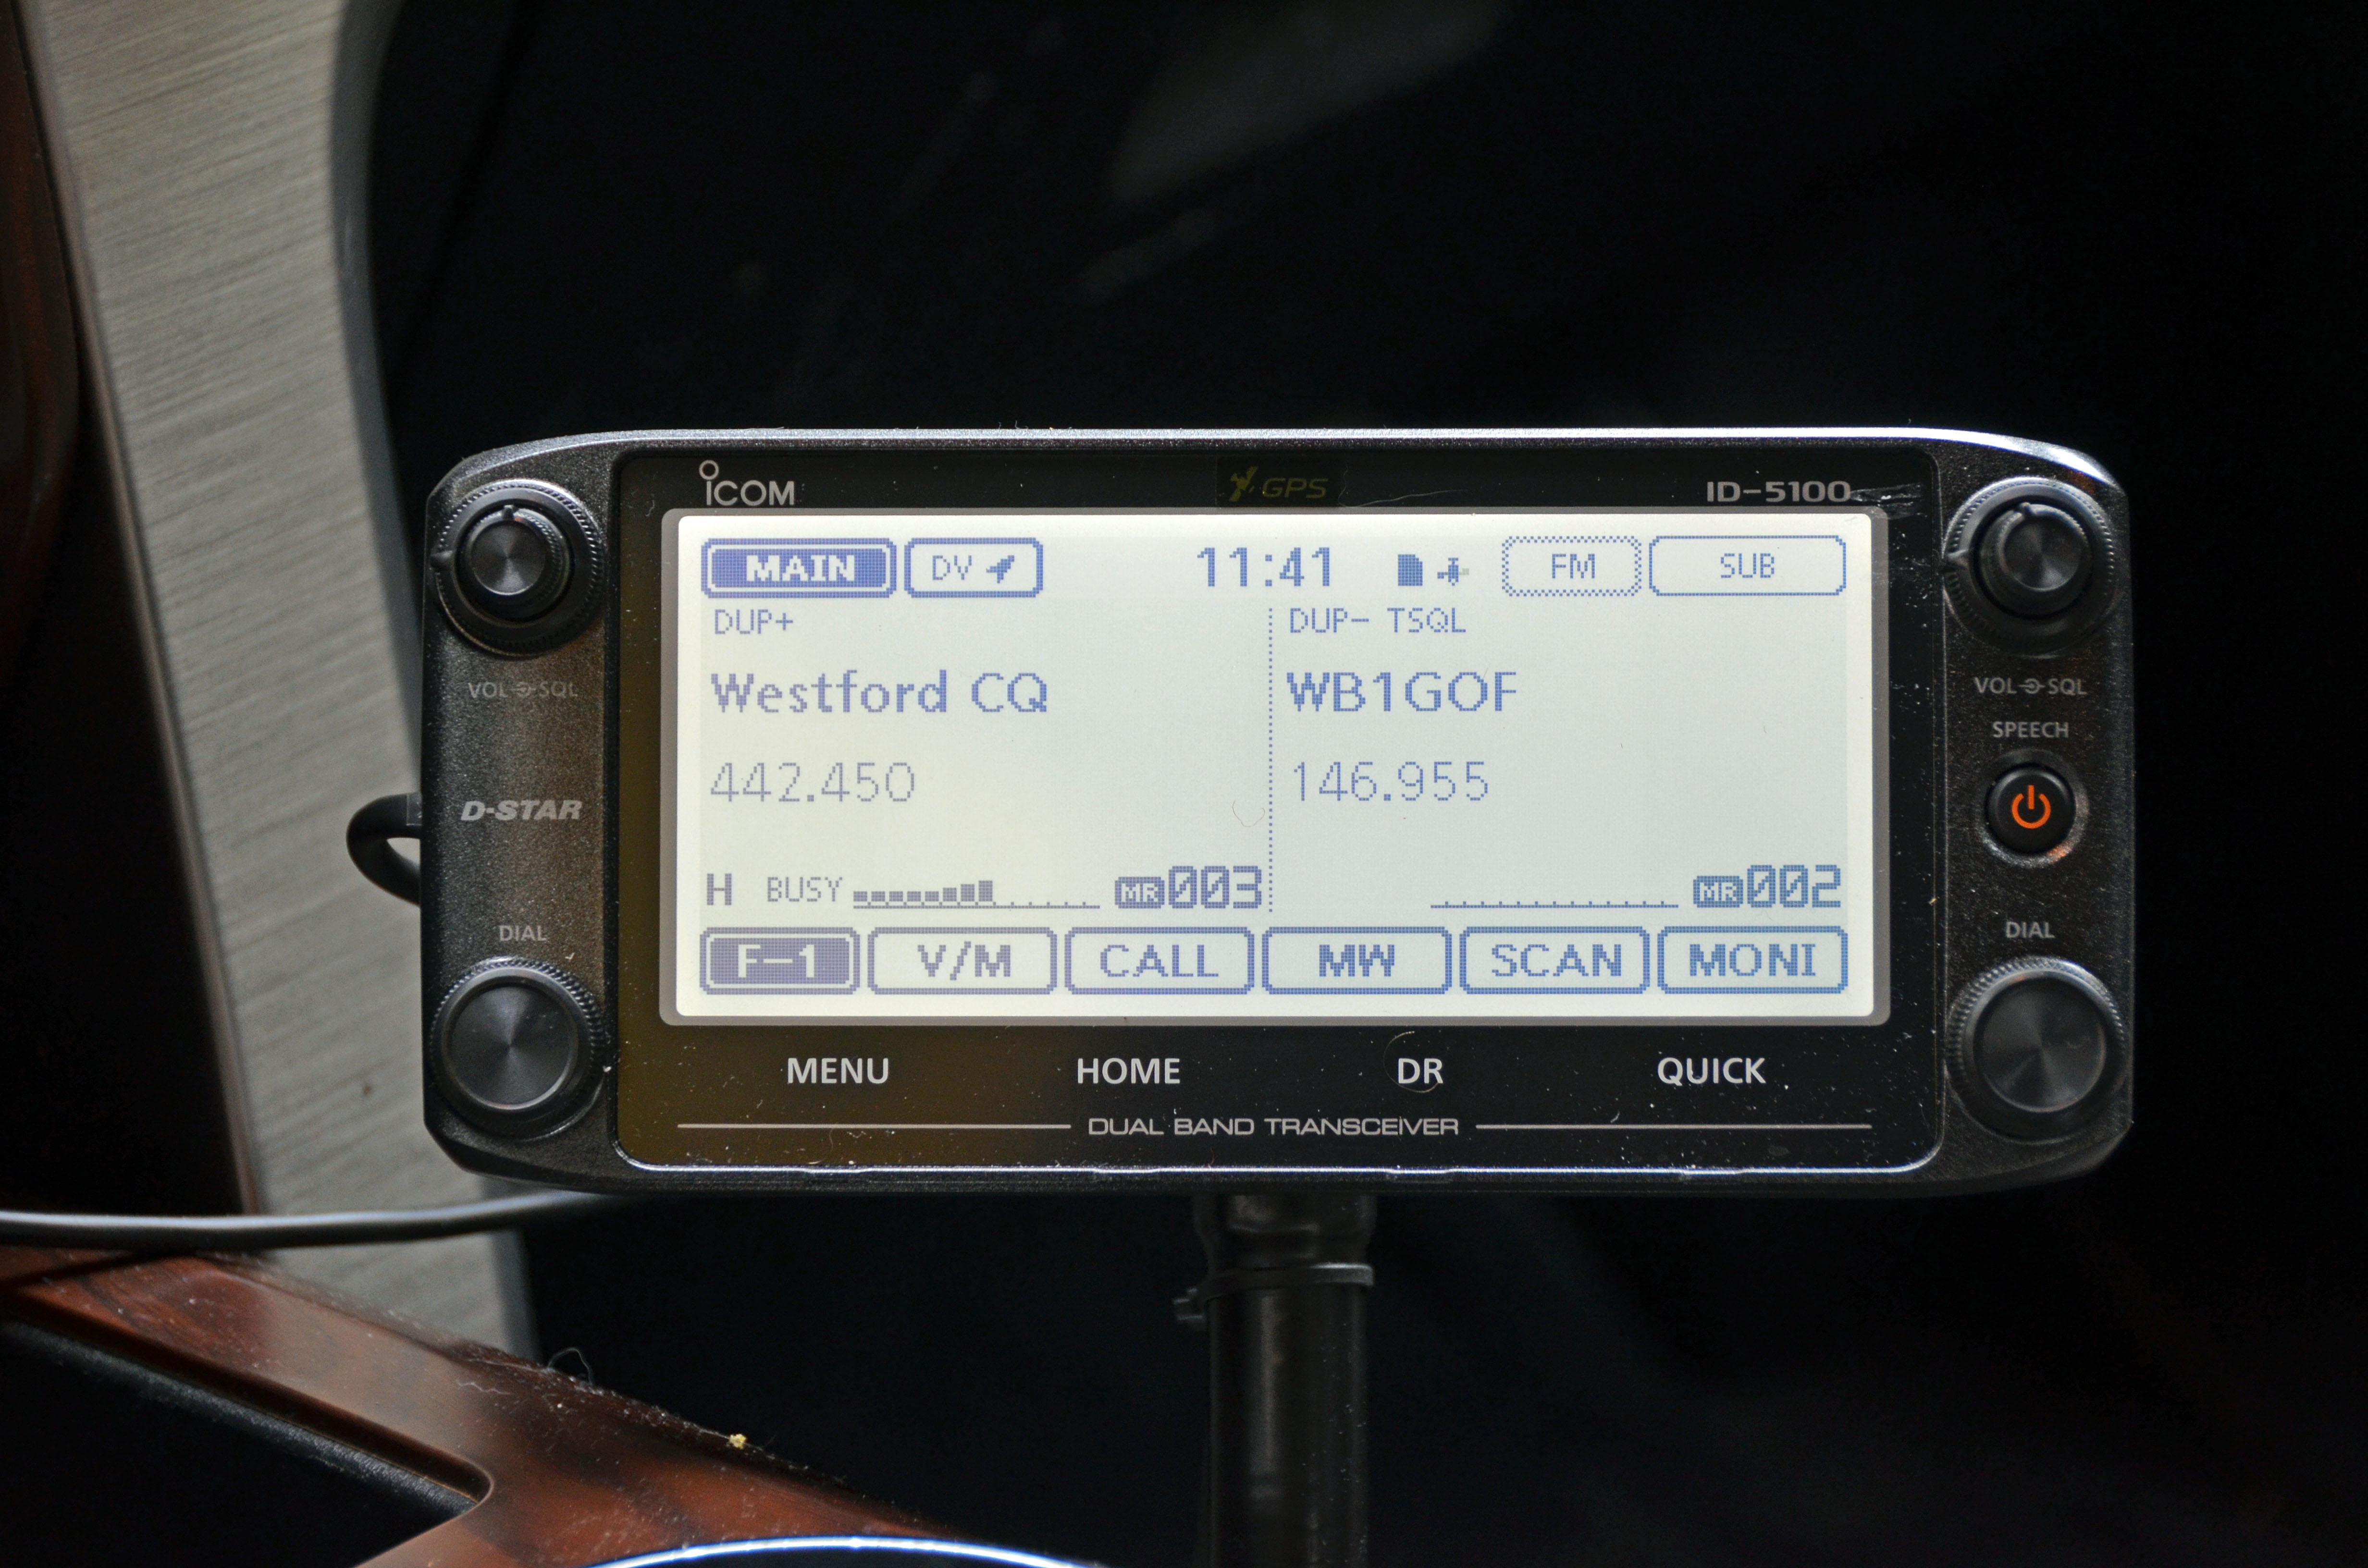 Mobile 2m/70cm FM Radio in a Vehicle